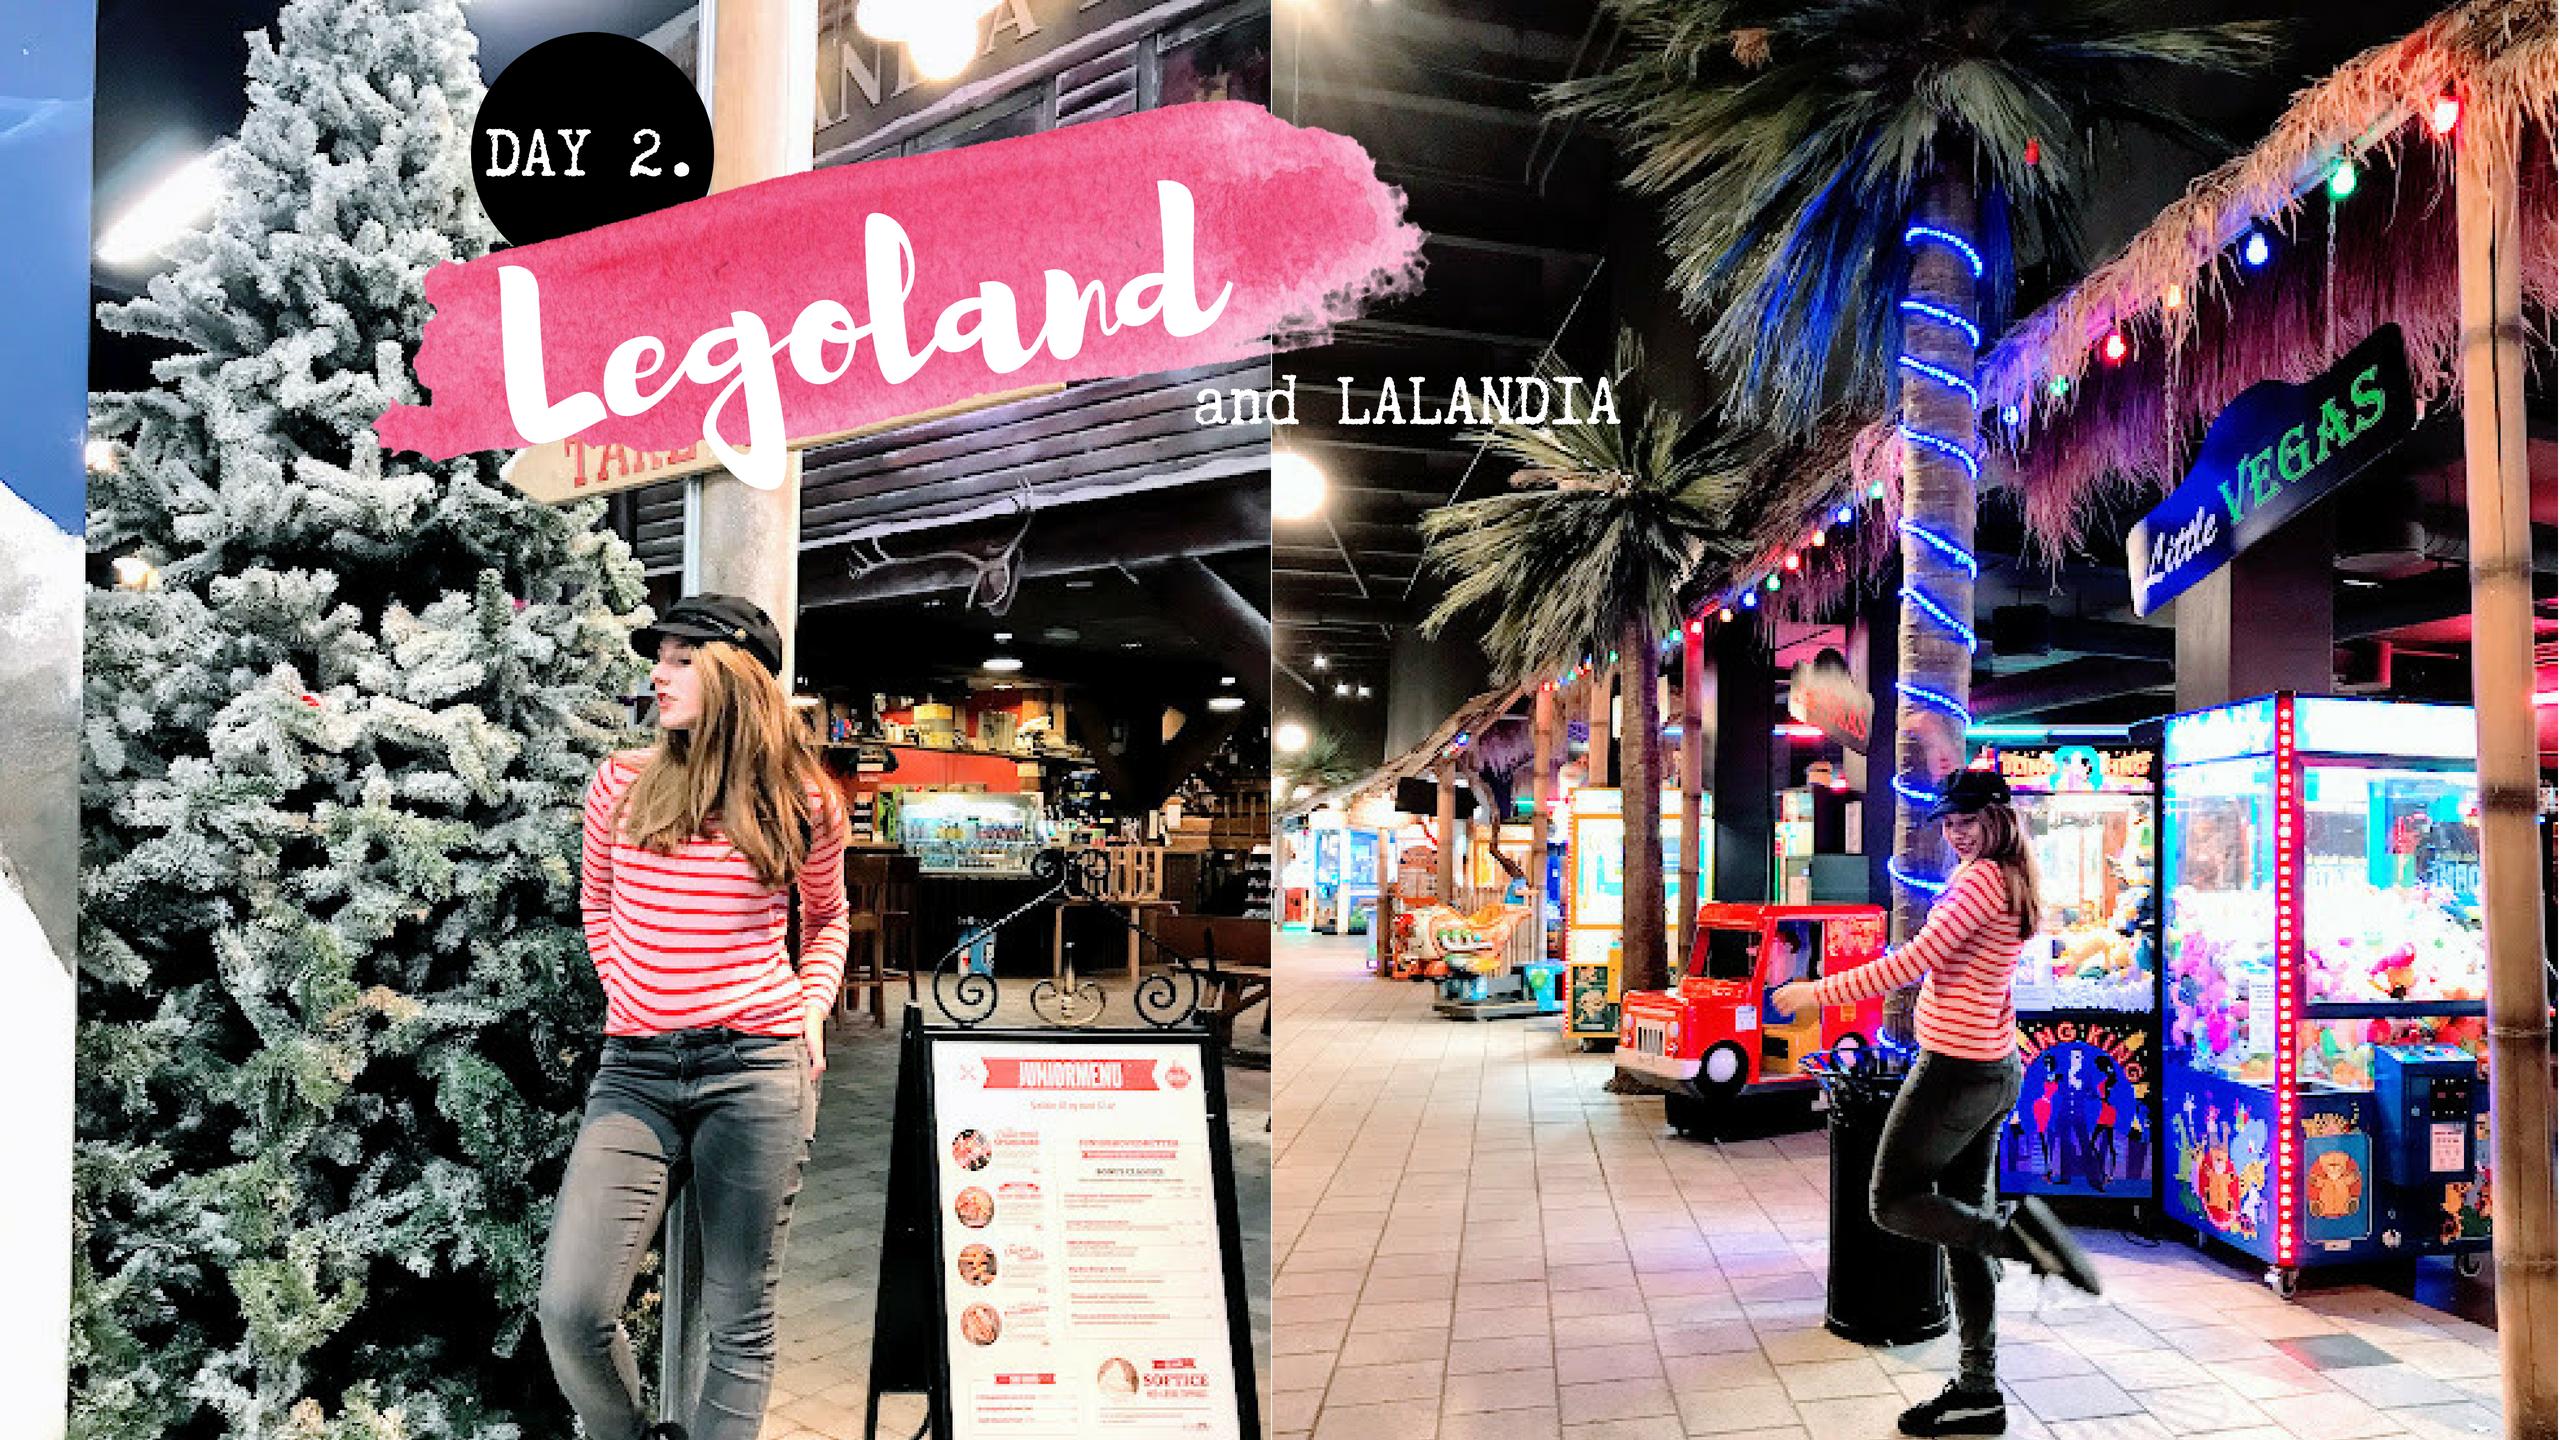 Lalandia, het waanzinnige overdekte entertainment center